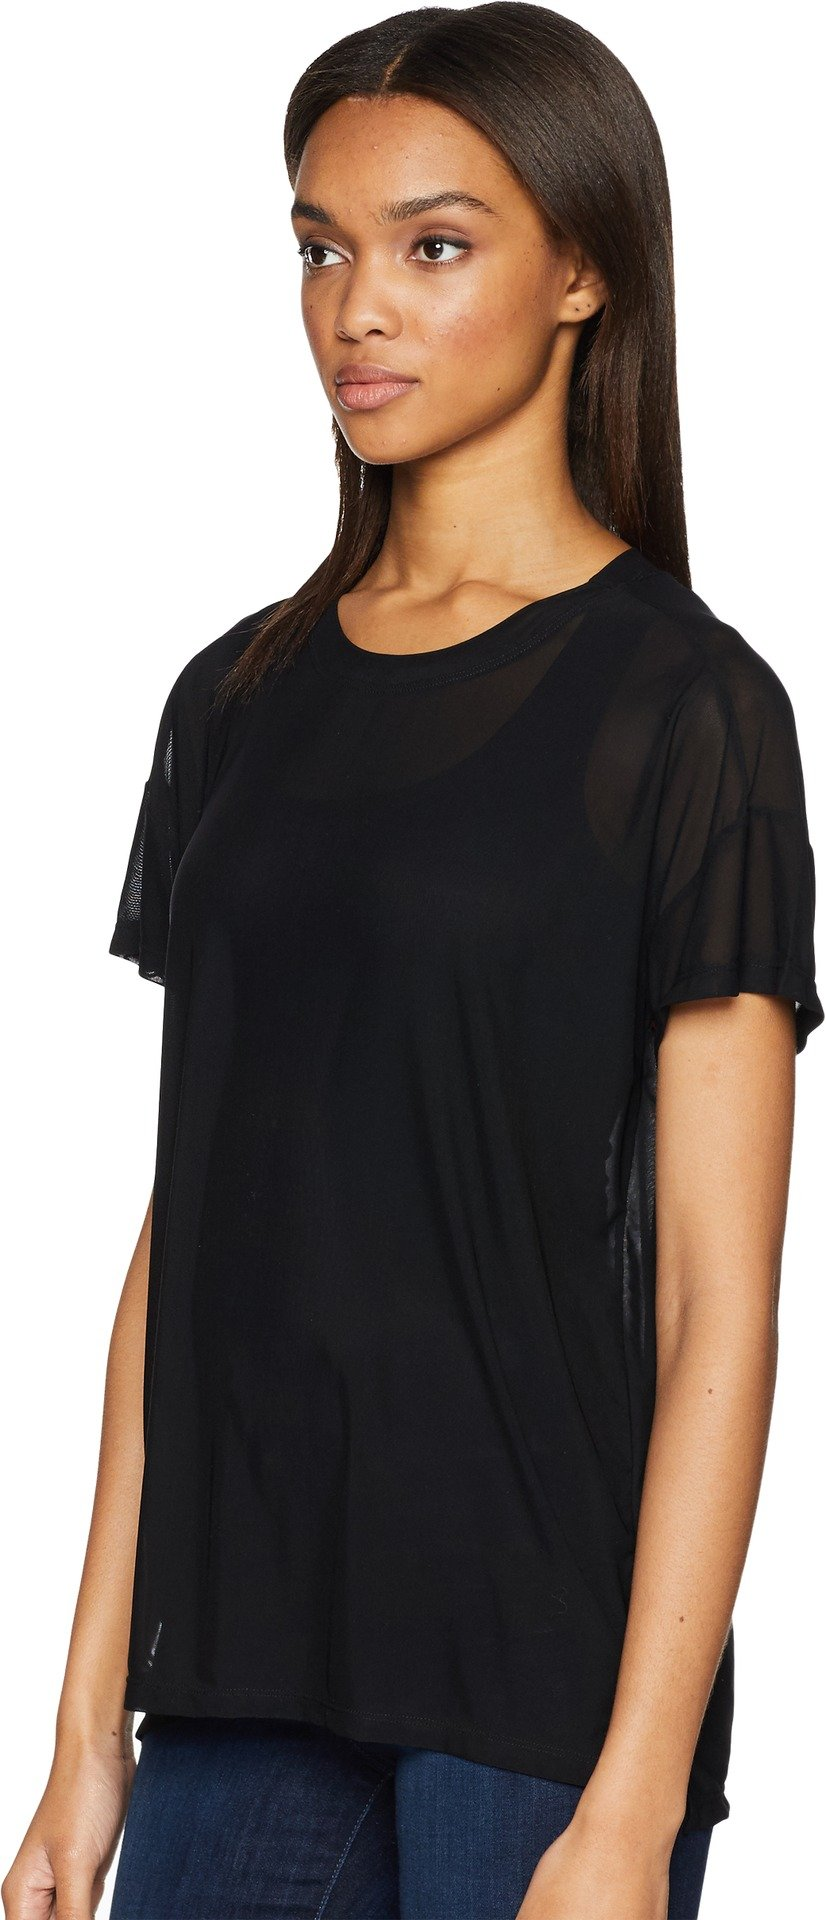 UNIONBAY Women's Fine Mesh Top, Black, Large by UNIONBAY (Image #1)